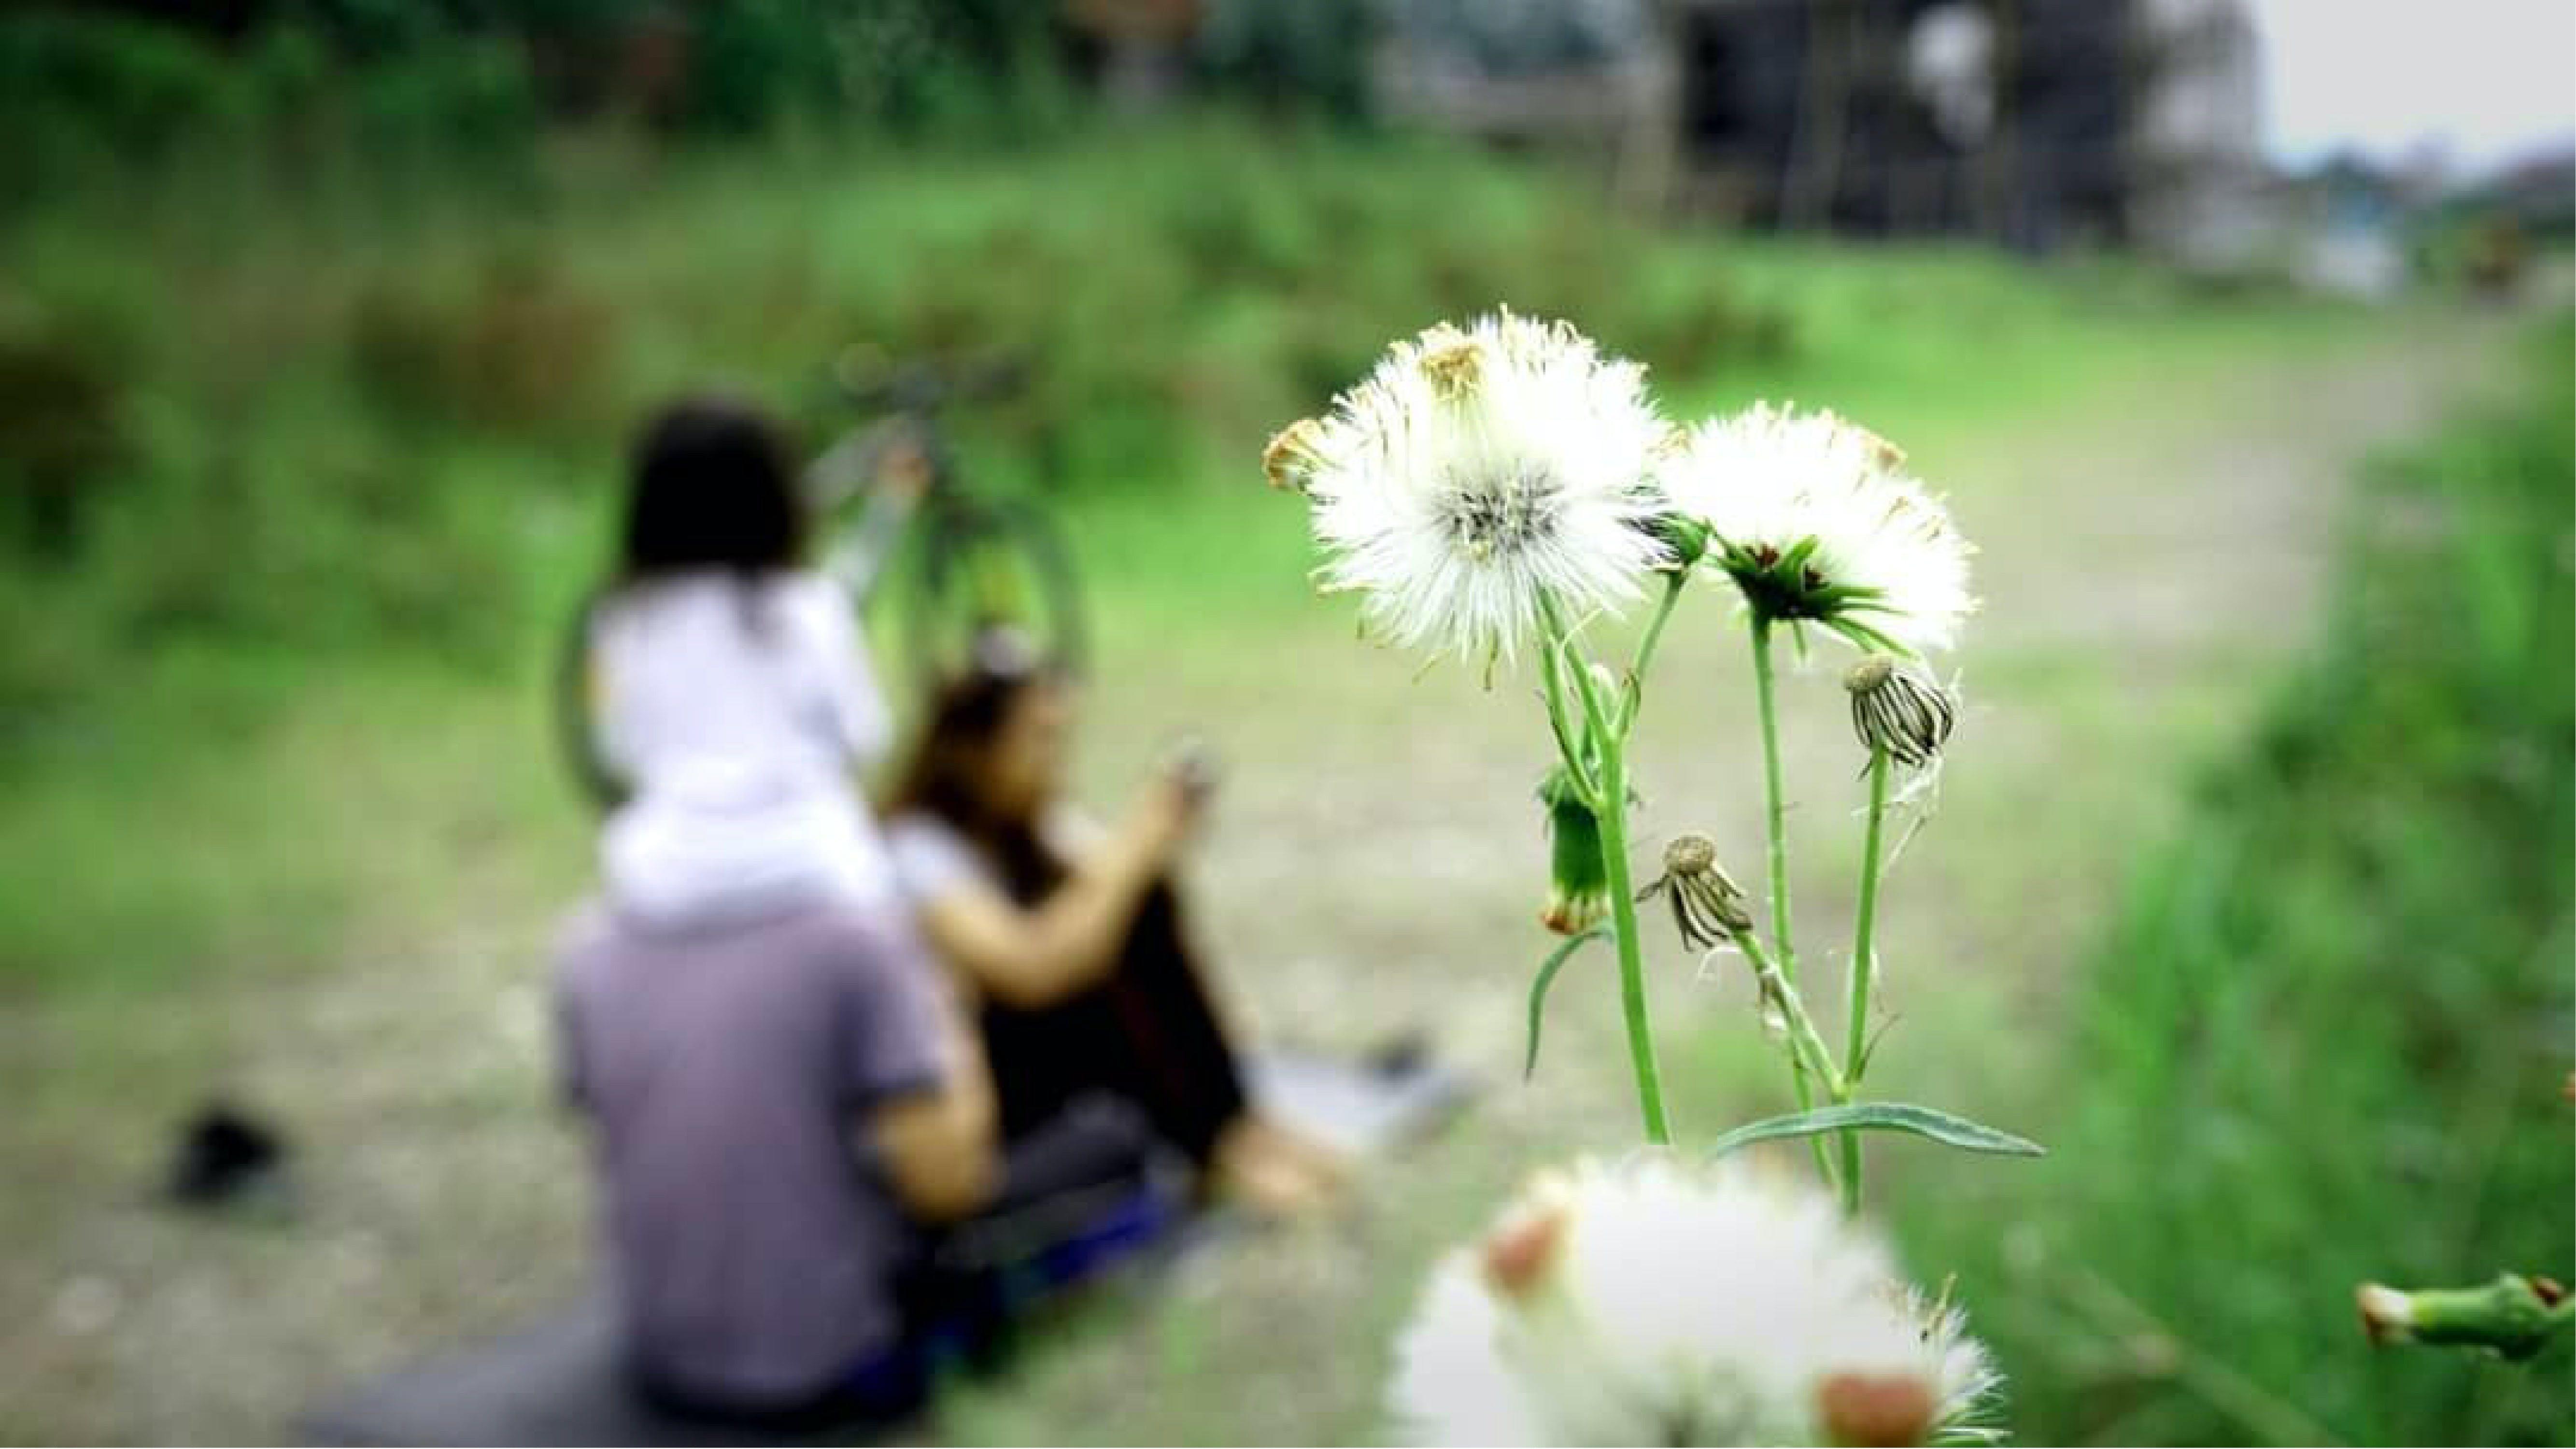 Selective Focus Photo of White Dandelion